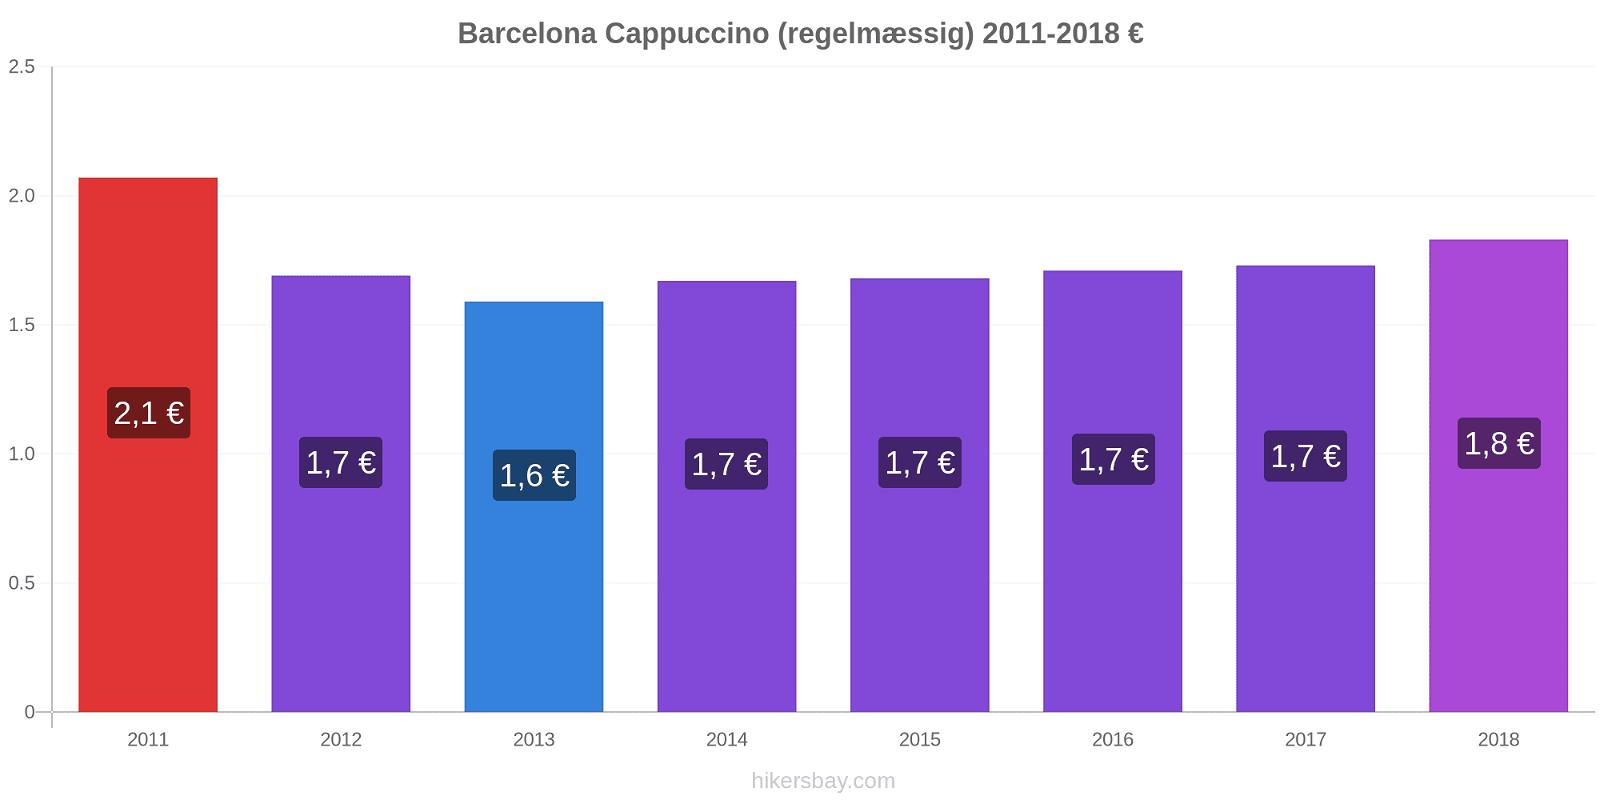 Barcelona prisændringer Cappuccino (regelmæssig) hikersbay.com